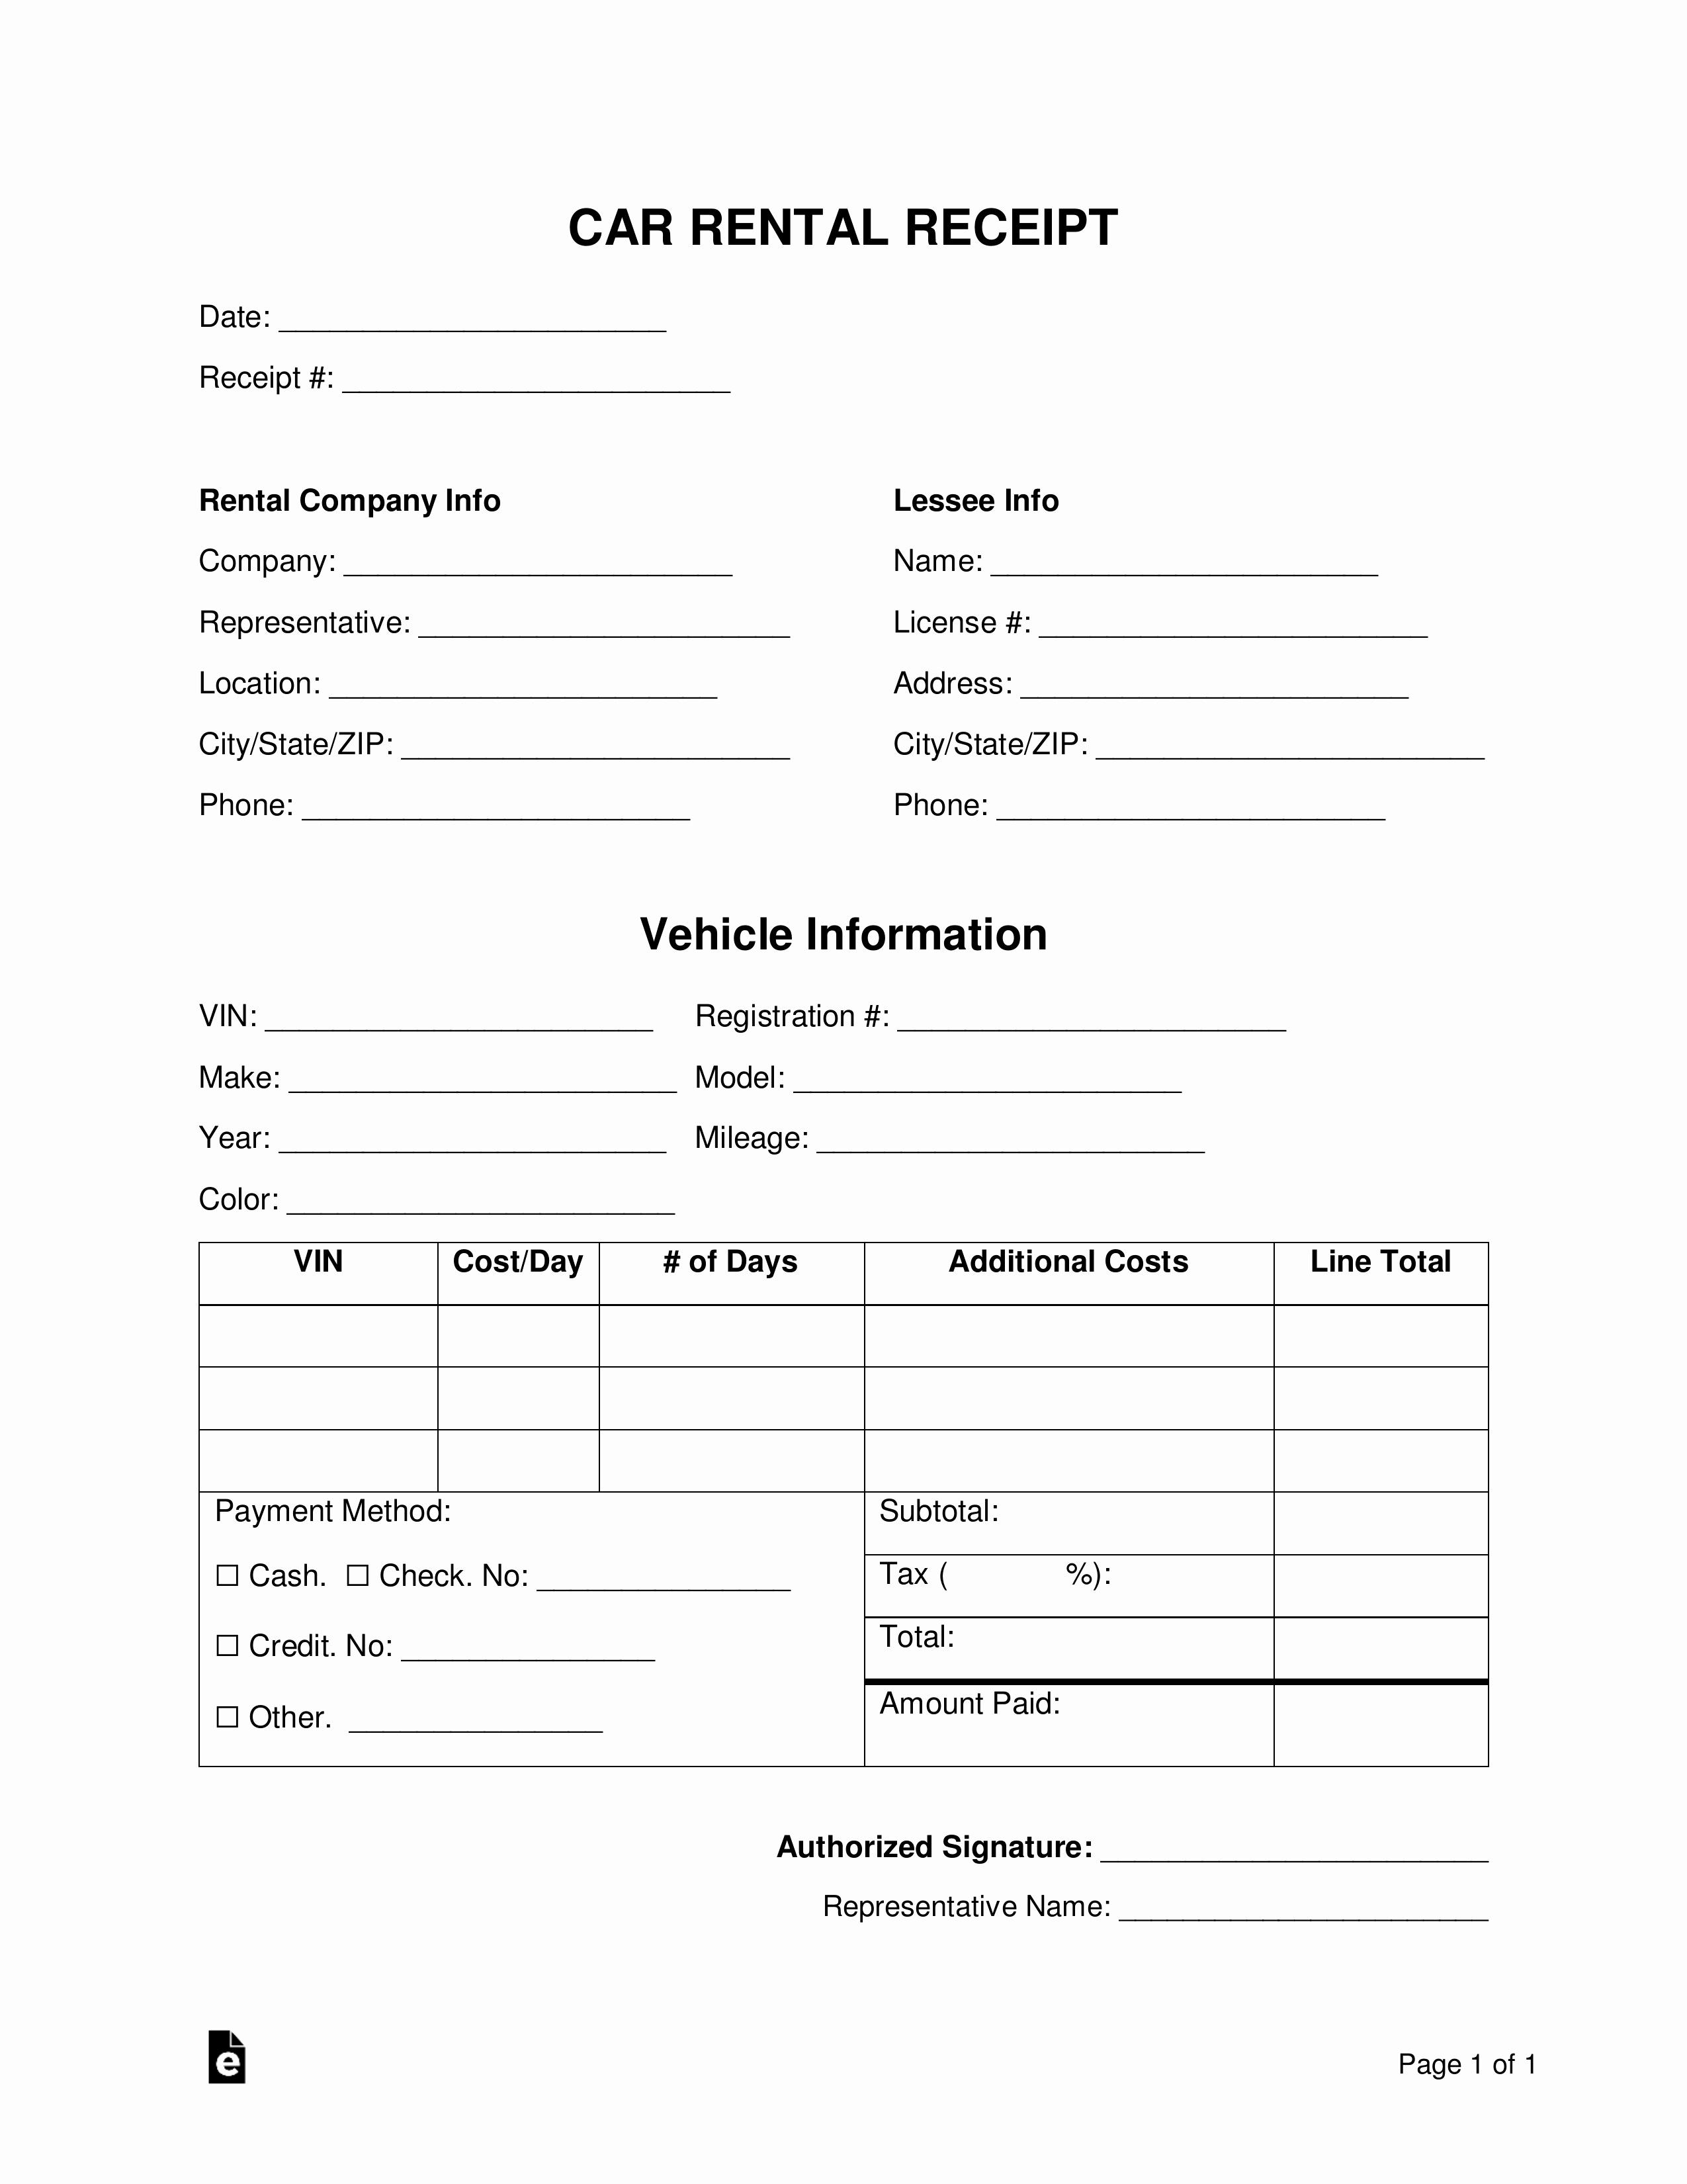 Rent Receipt Template Pdf Elegant Free Car Rental Receipt Template Word Pdf